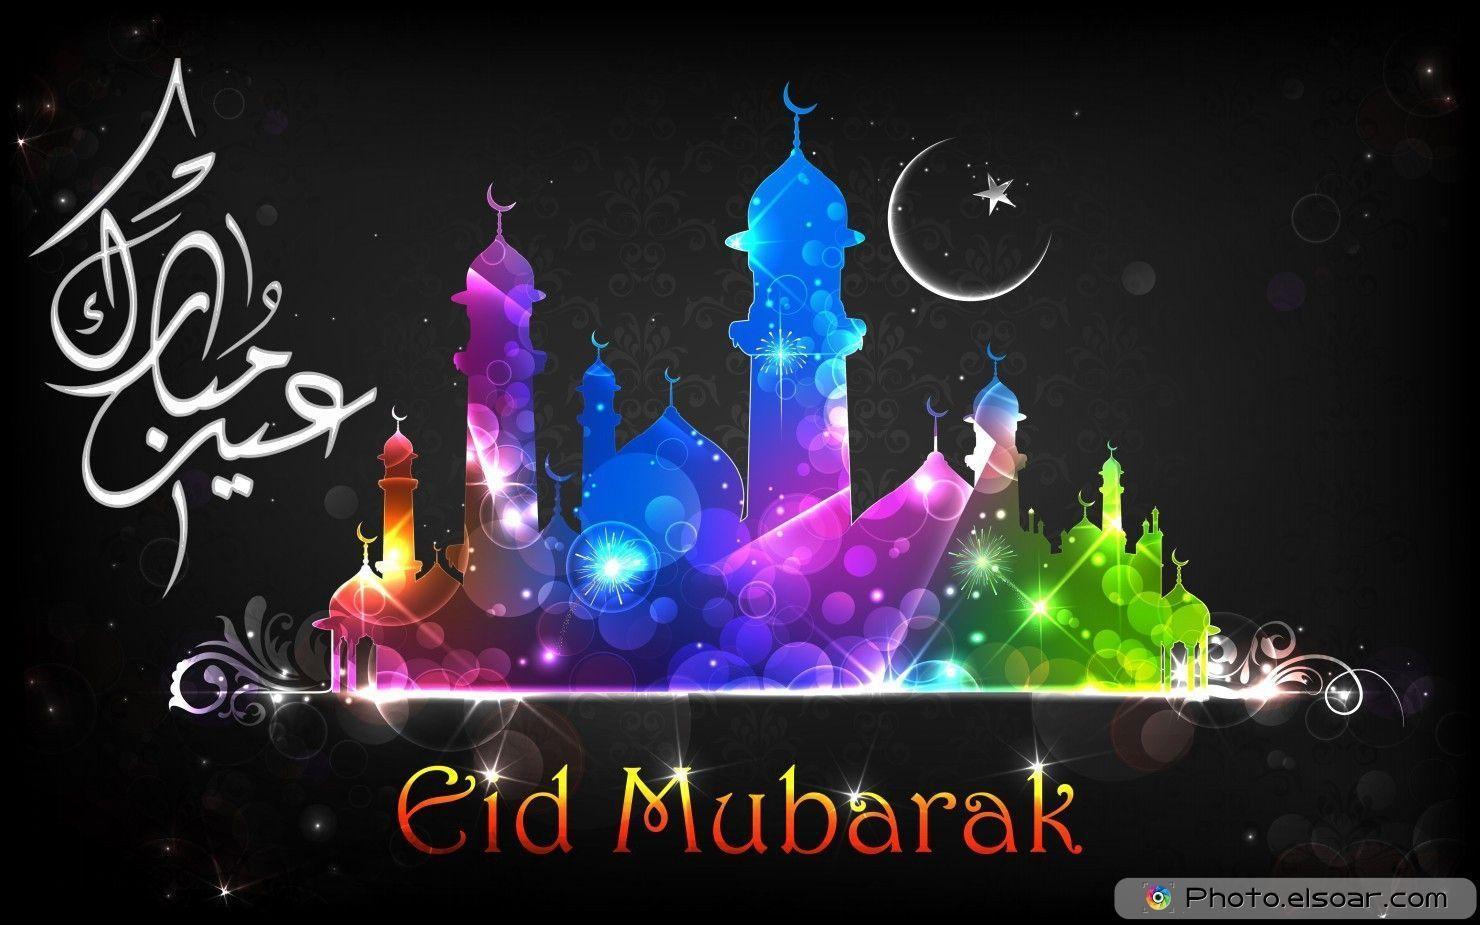 Eid Mubarak Wallpapers Top Free Eid Mubarak Backgrounds Wallpaperaccess